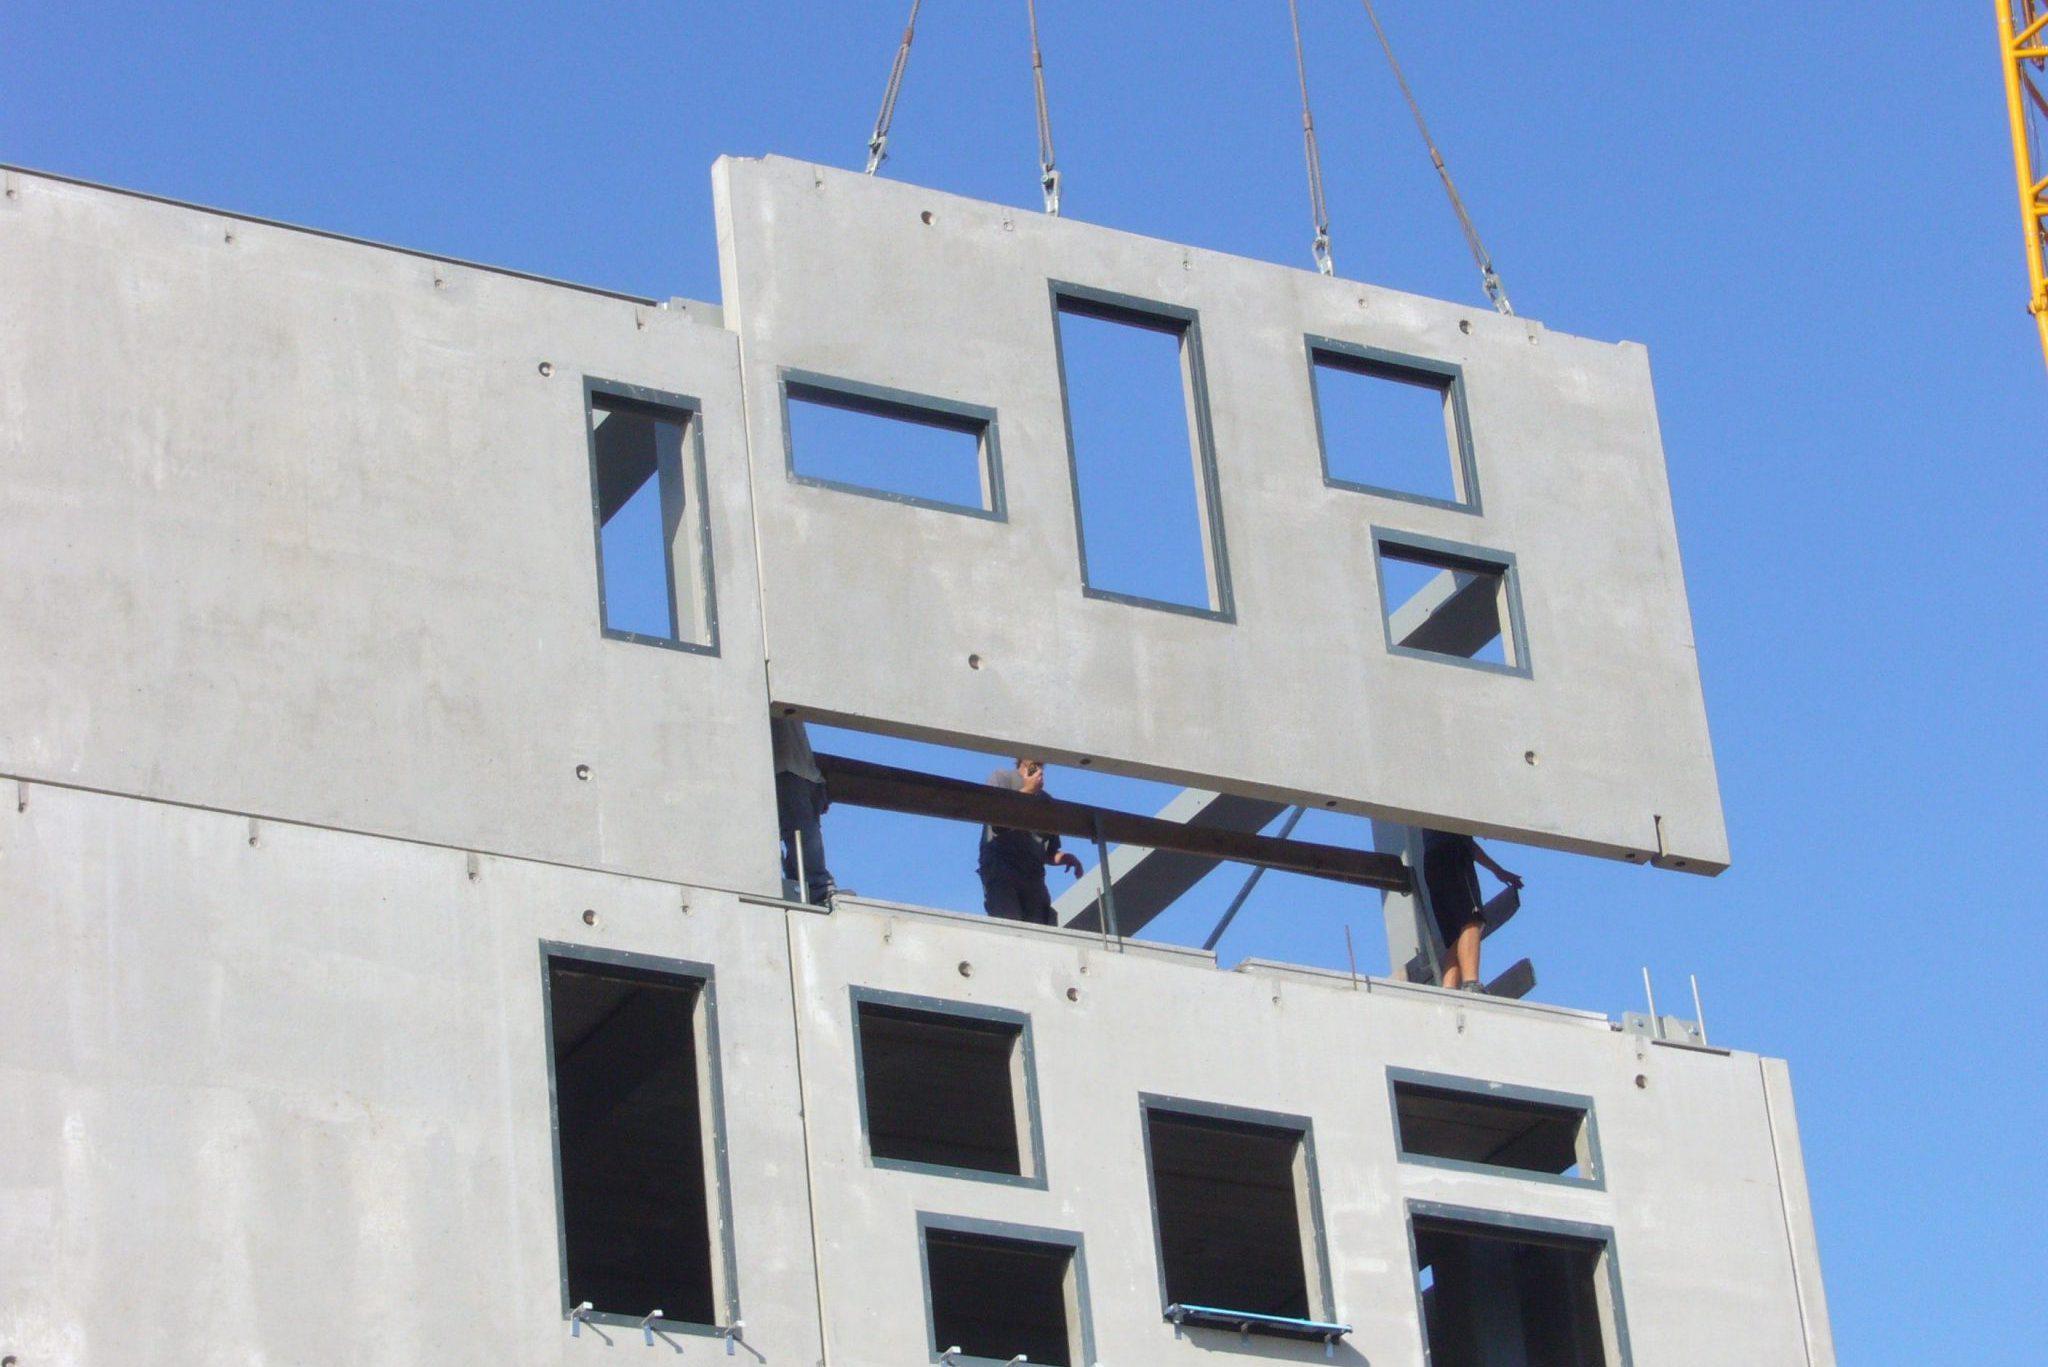 betonakkoord, betonelement